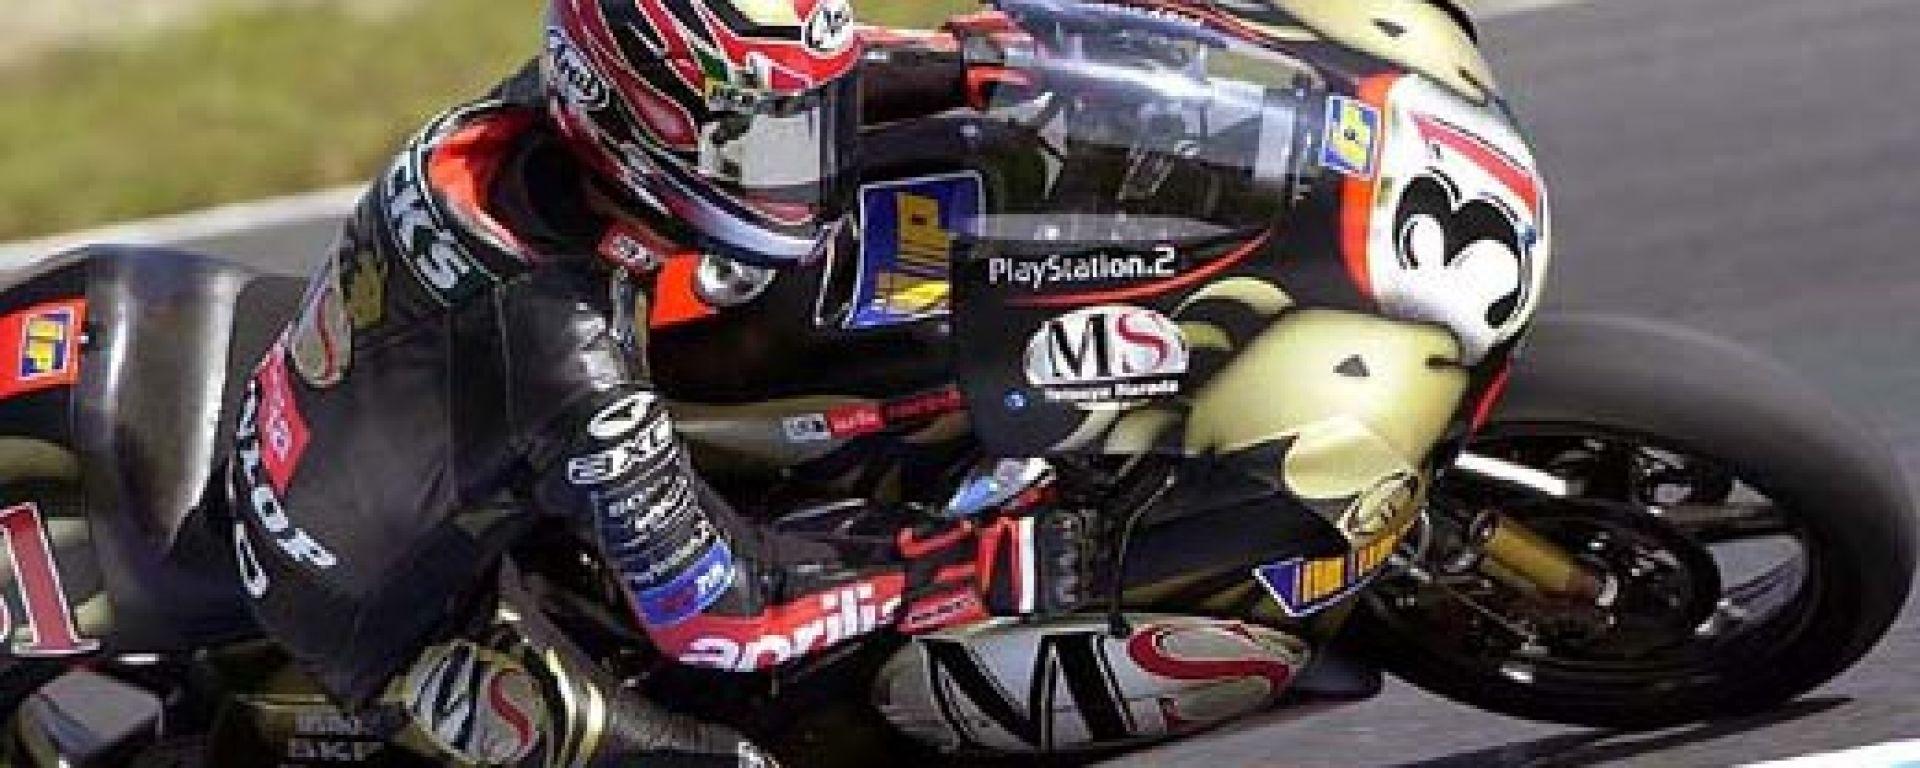 GP Australia: Classe 250